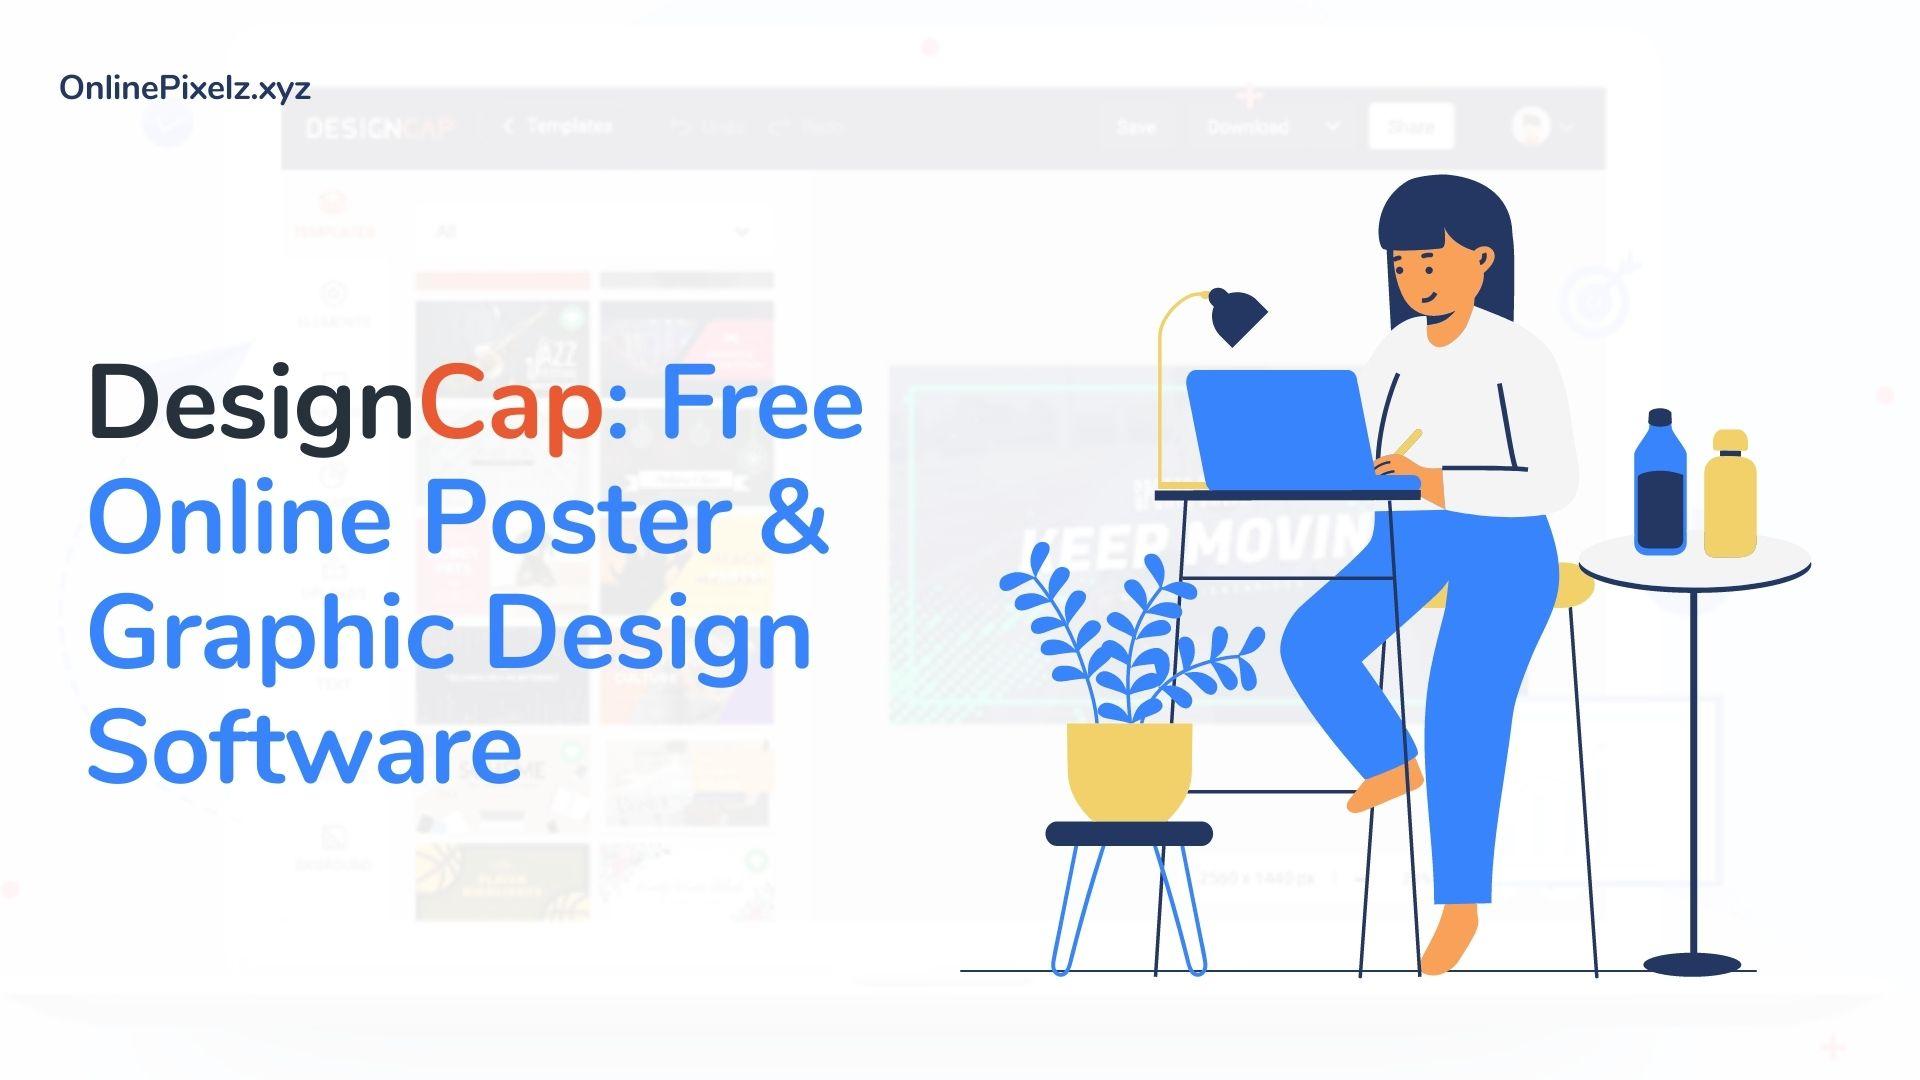 DesignCap: Free Online Poster & Graphic Design Software